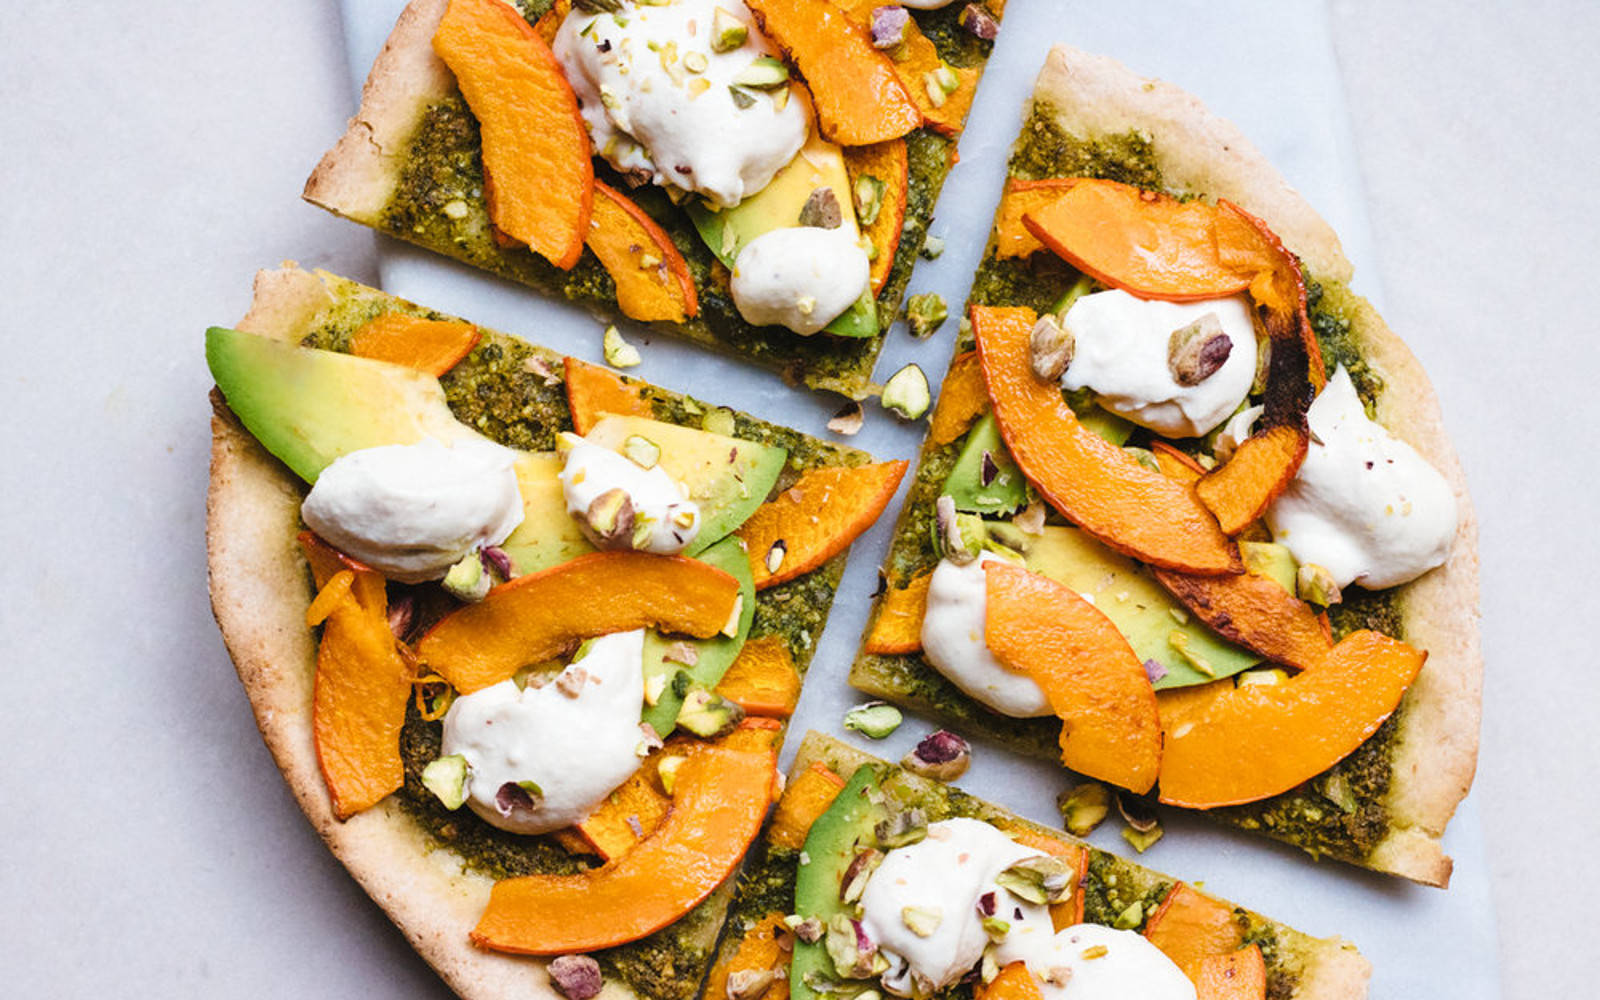 Vegan Gluten-Free Fall Harvest Pizza with avocado, vegan cheese, and pumpkin 1